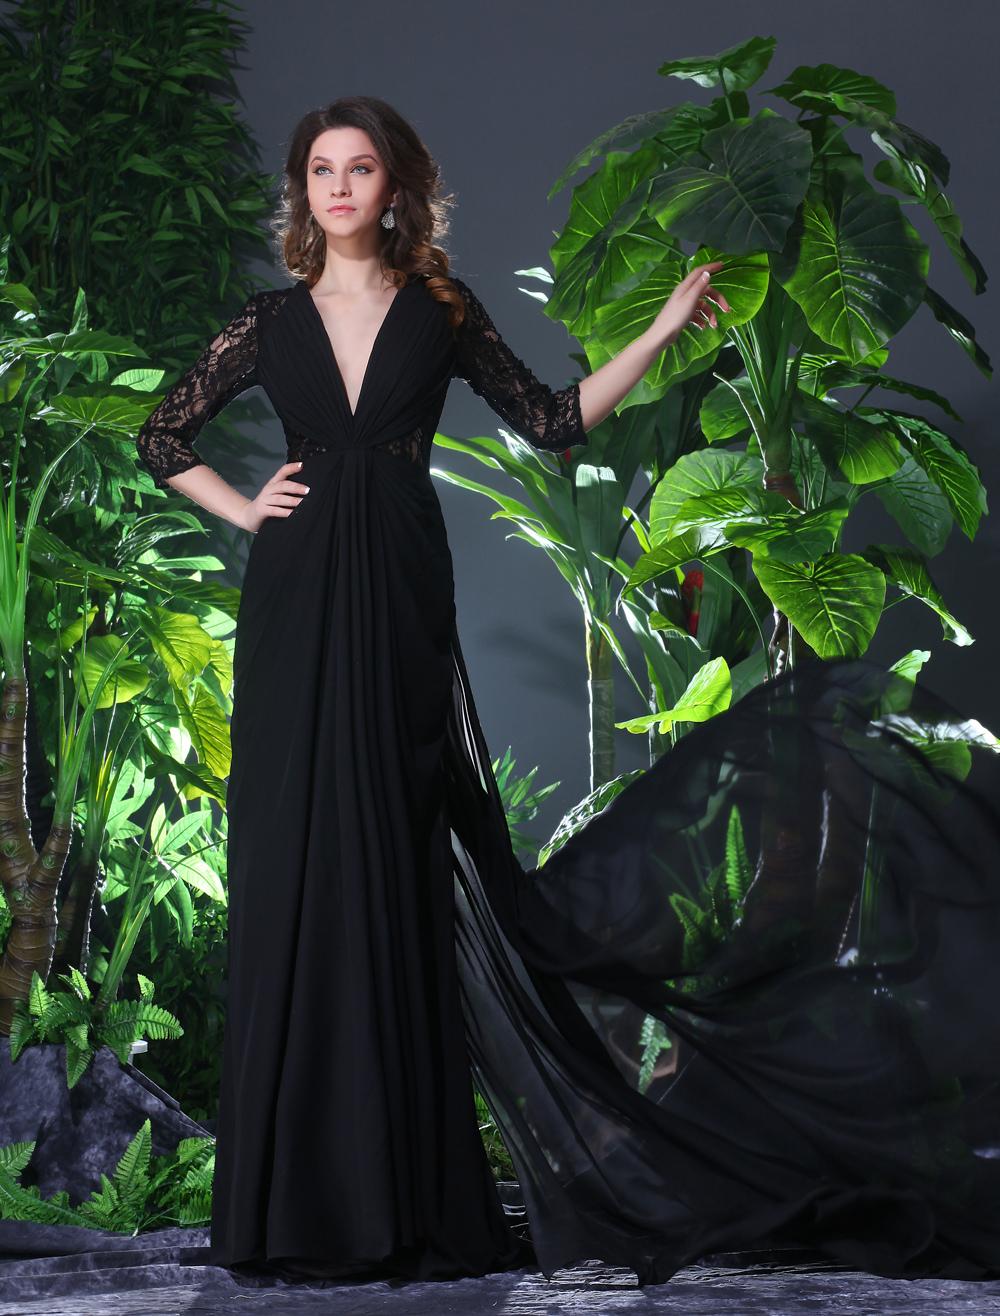 Elegant Black Chiffon Cut Out V-Neck Sexy Evening Dress  Wedding Guest Dress Milanoo